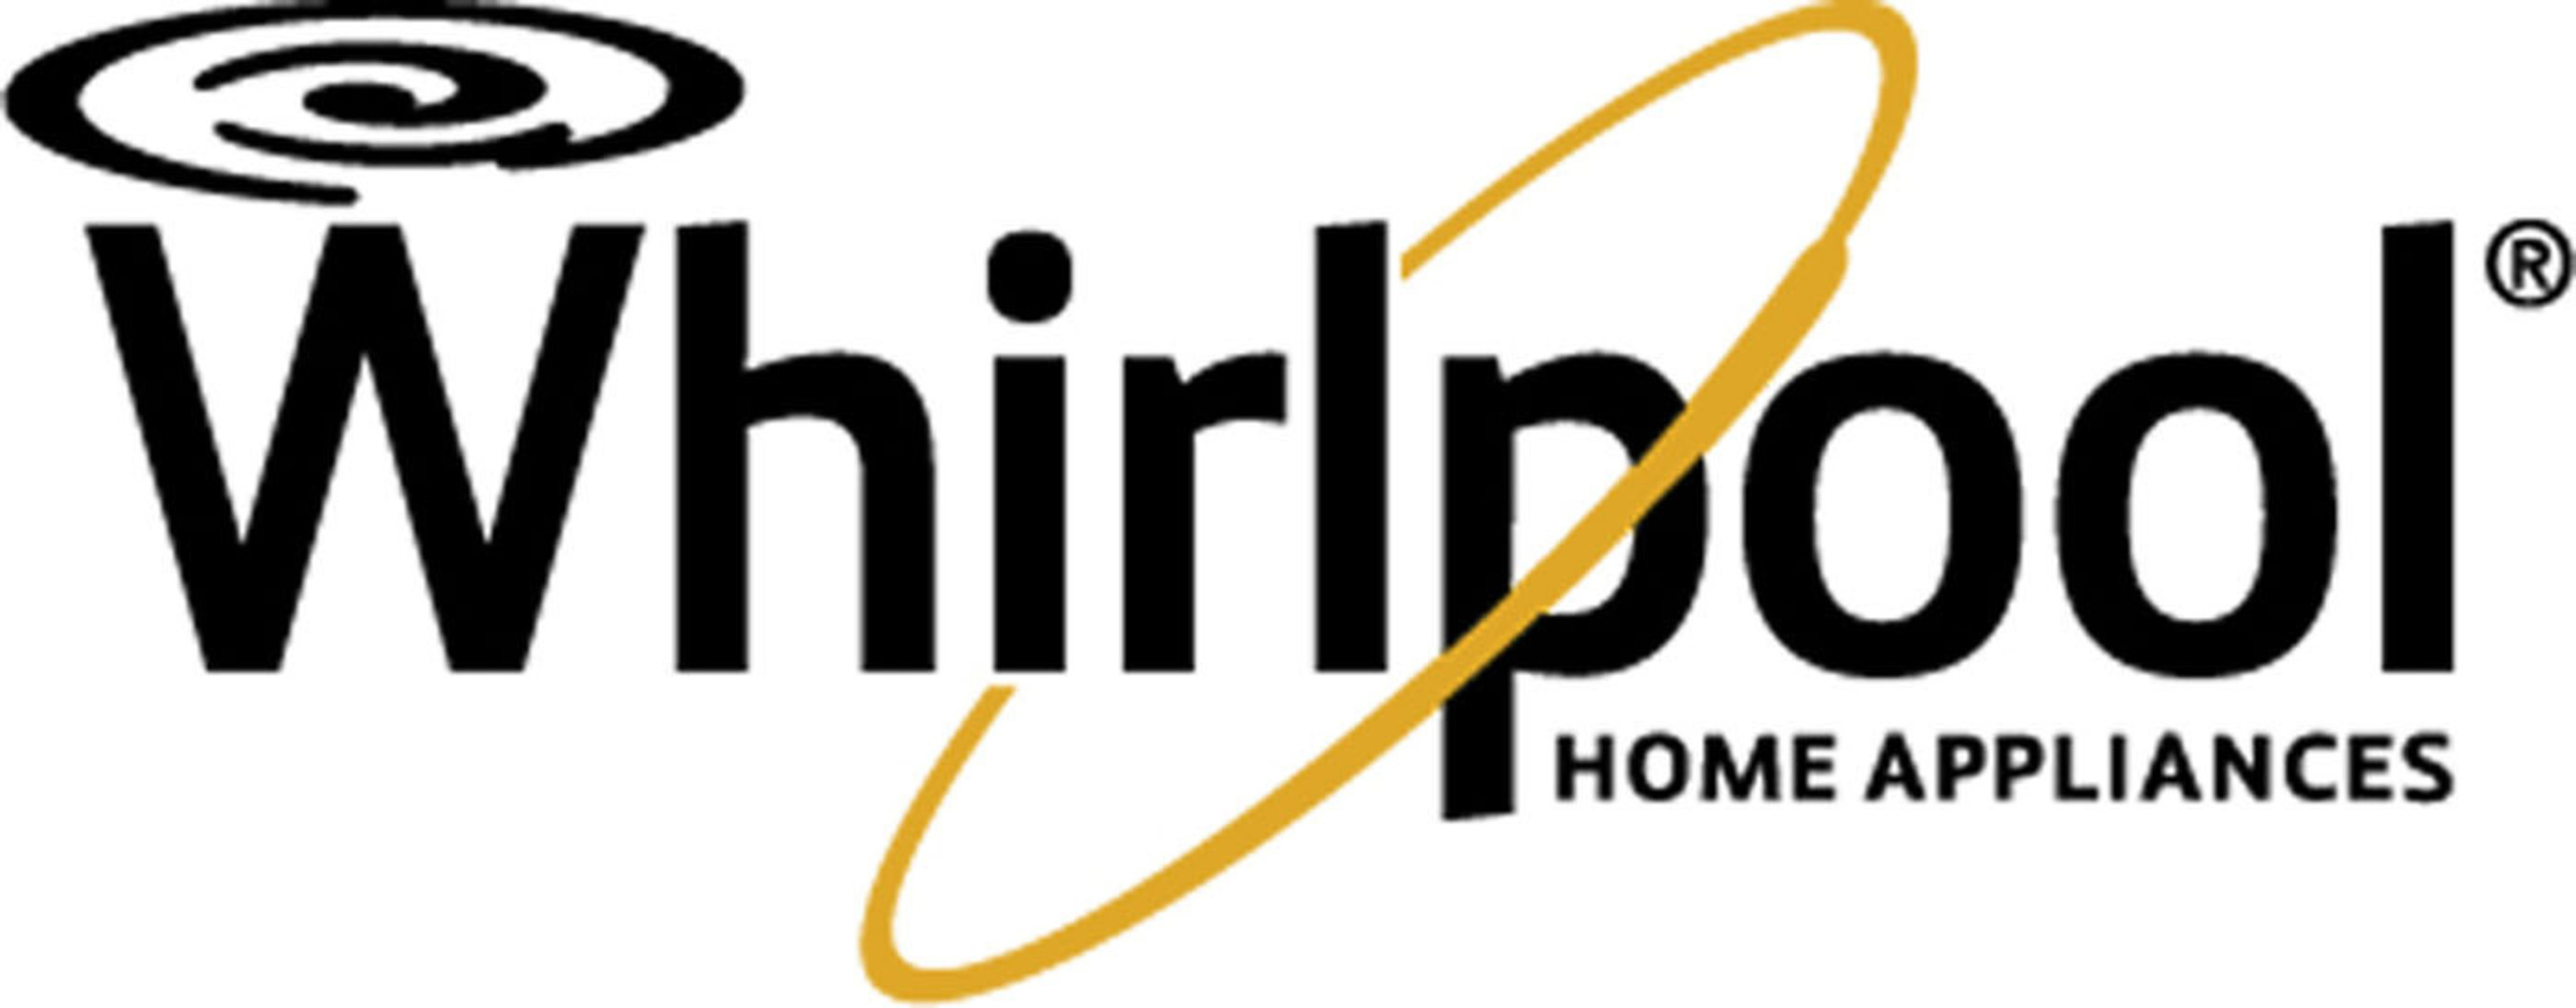 Whirlpool Brands Logo